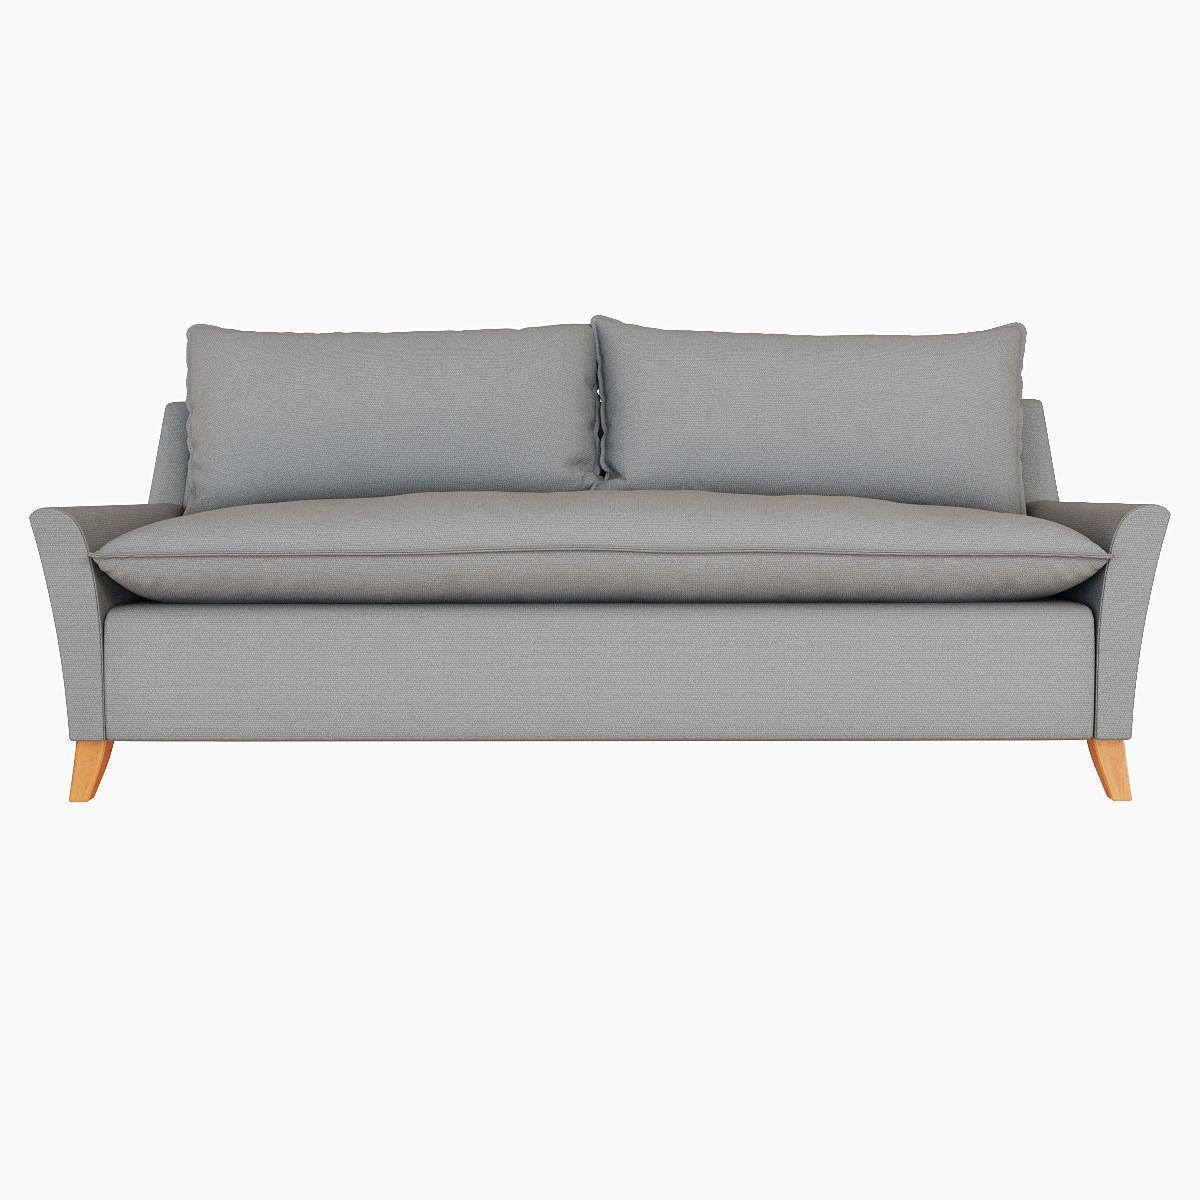 ... West Elm Bliss Down Filled Sofa 3d Model Max Obj Fbx Mtl 3 ...